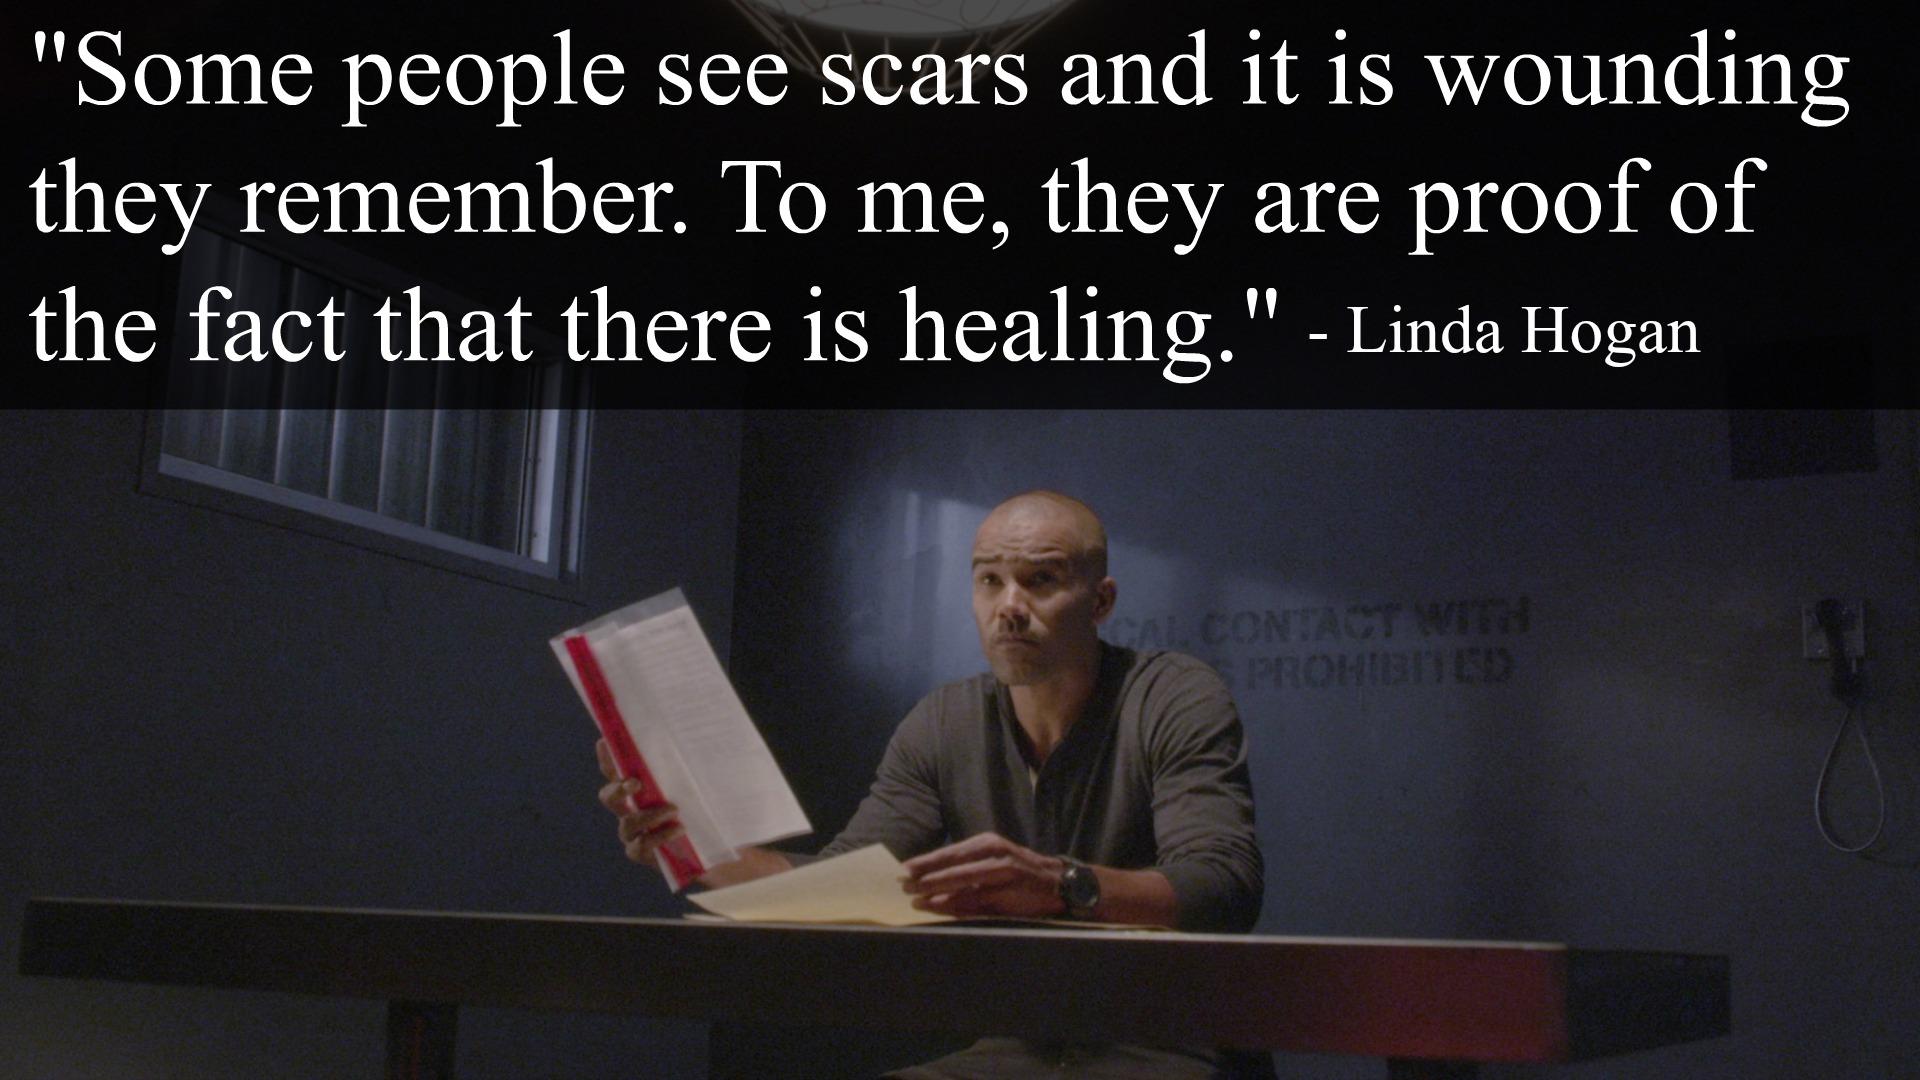 Linda Hogan - Poet and playwright